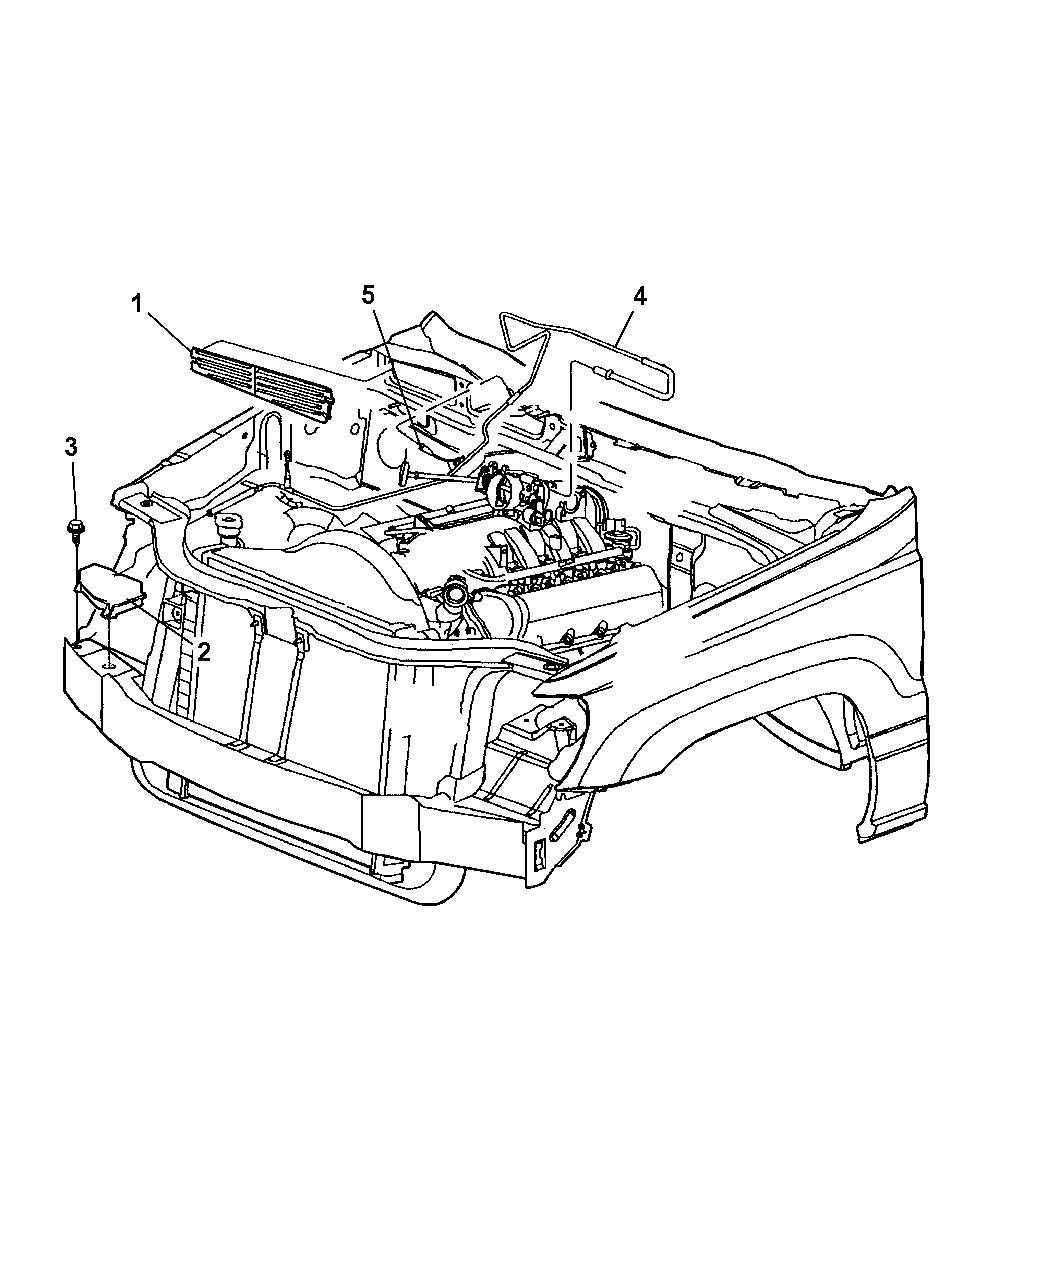 2003 Jeep Grand Cherokee HEVAC Vacuum Engine Lines & Controls